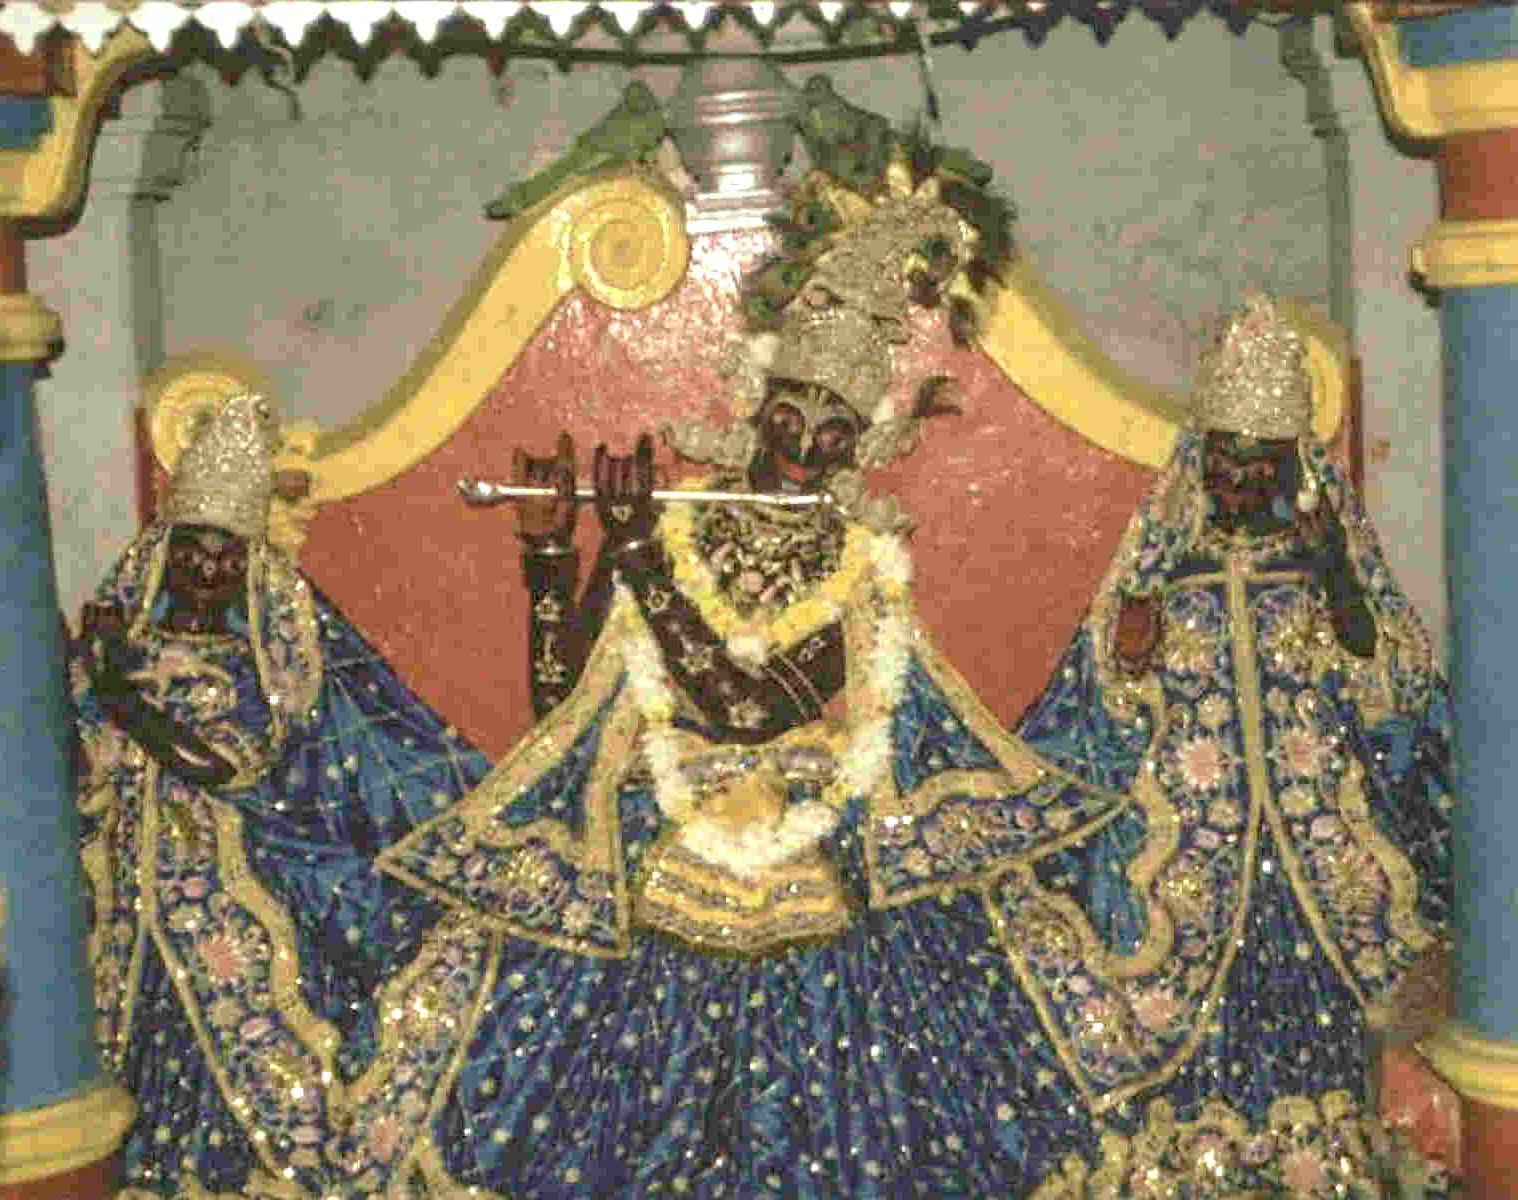 Totagopinathapuri